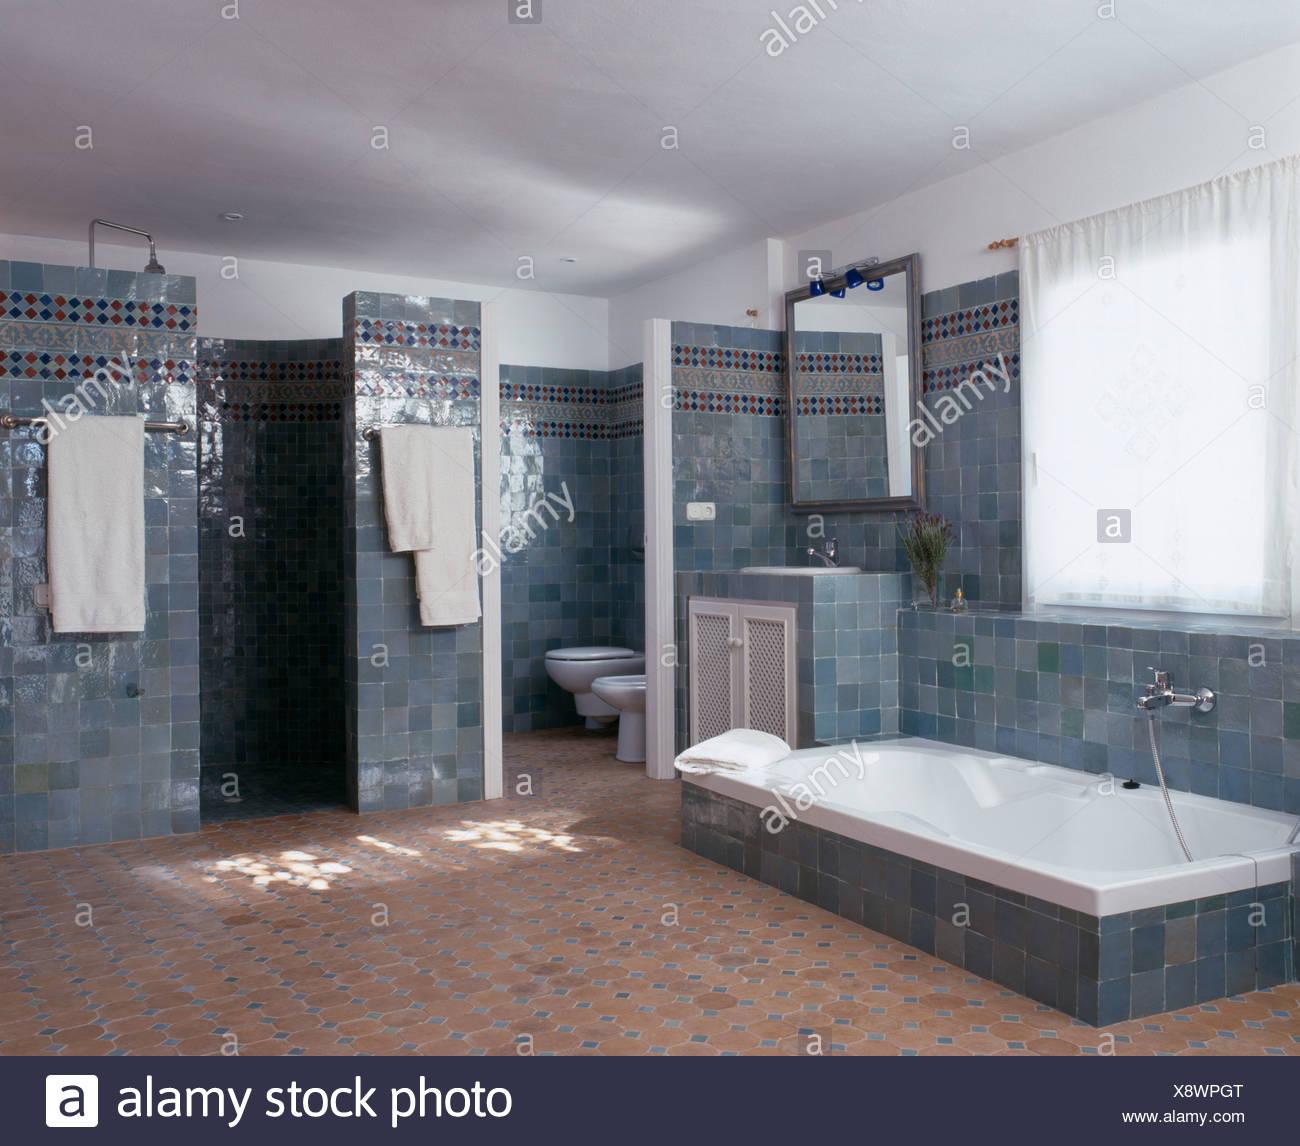 Bathroom Design With Sunken Tub Html on bathroom designs with tub shower combos, bathroom garden tub decorating ideas, bathroom with corner jacuzzi tub, bathroom design with whirlpool tub, bathroom design with clawfoot tub, bathroom remodel with corner tub, bathroom design ideas, bathroom design trends 2015, bathroom jacuzzi decorating ideas, bathroom shower soaking tub, tuscan sun spa hot tub, bathroom design with black tub, bathroom floor tile ideas, bathroom garden tub decor ideas, bathroom corner tub with shower ideas, master bathroom design with soaking tub, bathroom designs corner bath tubs, bathroom wall for tv,